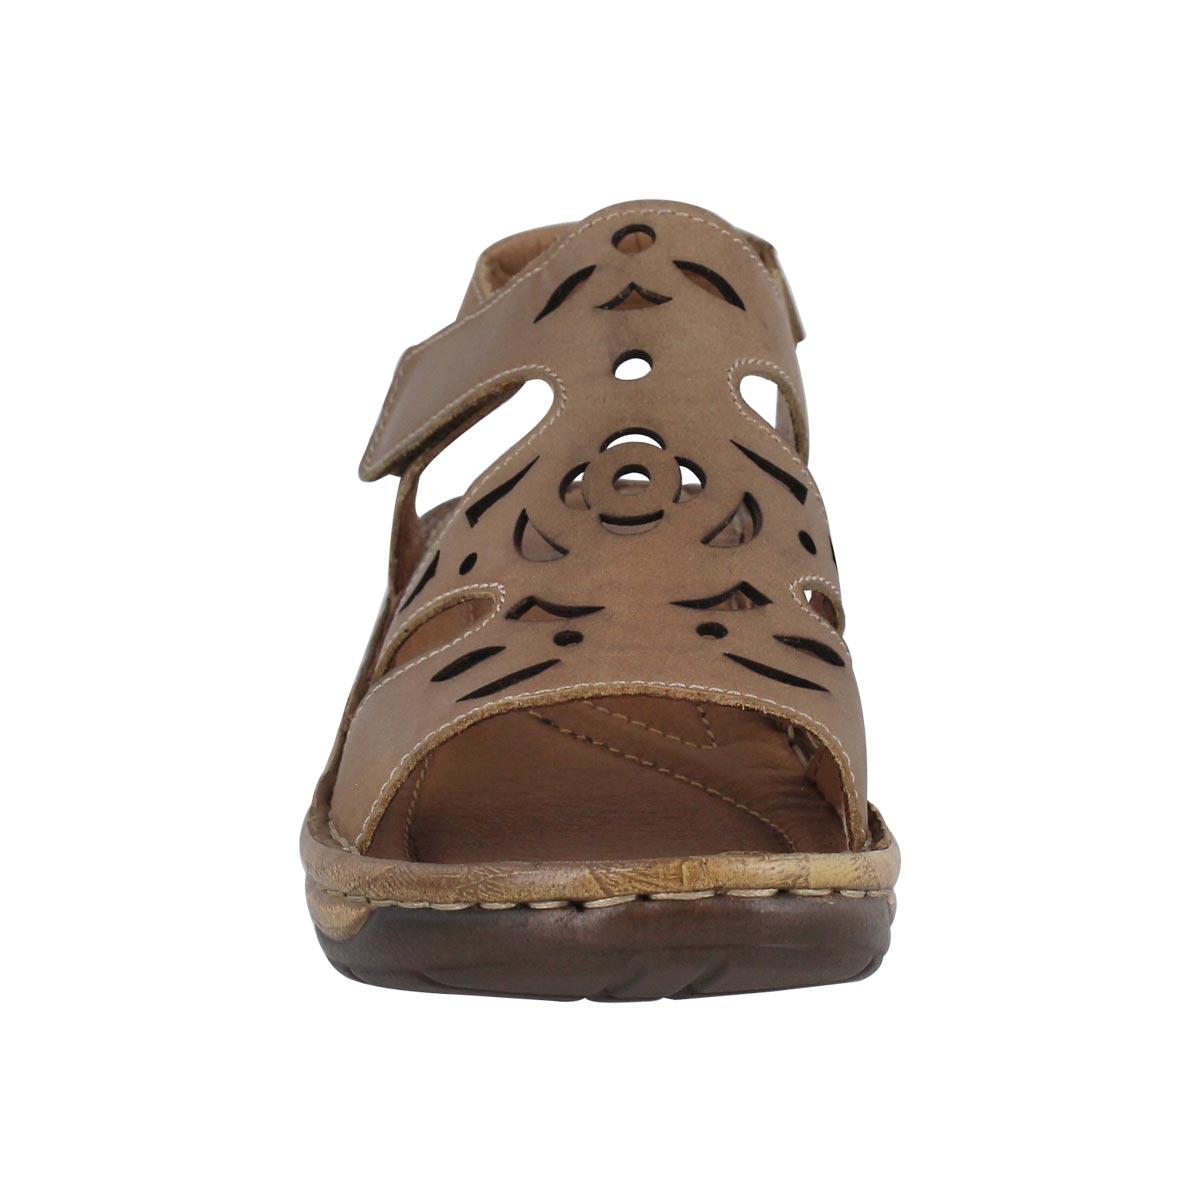 Lds Catalonia 56 sand sandal